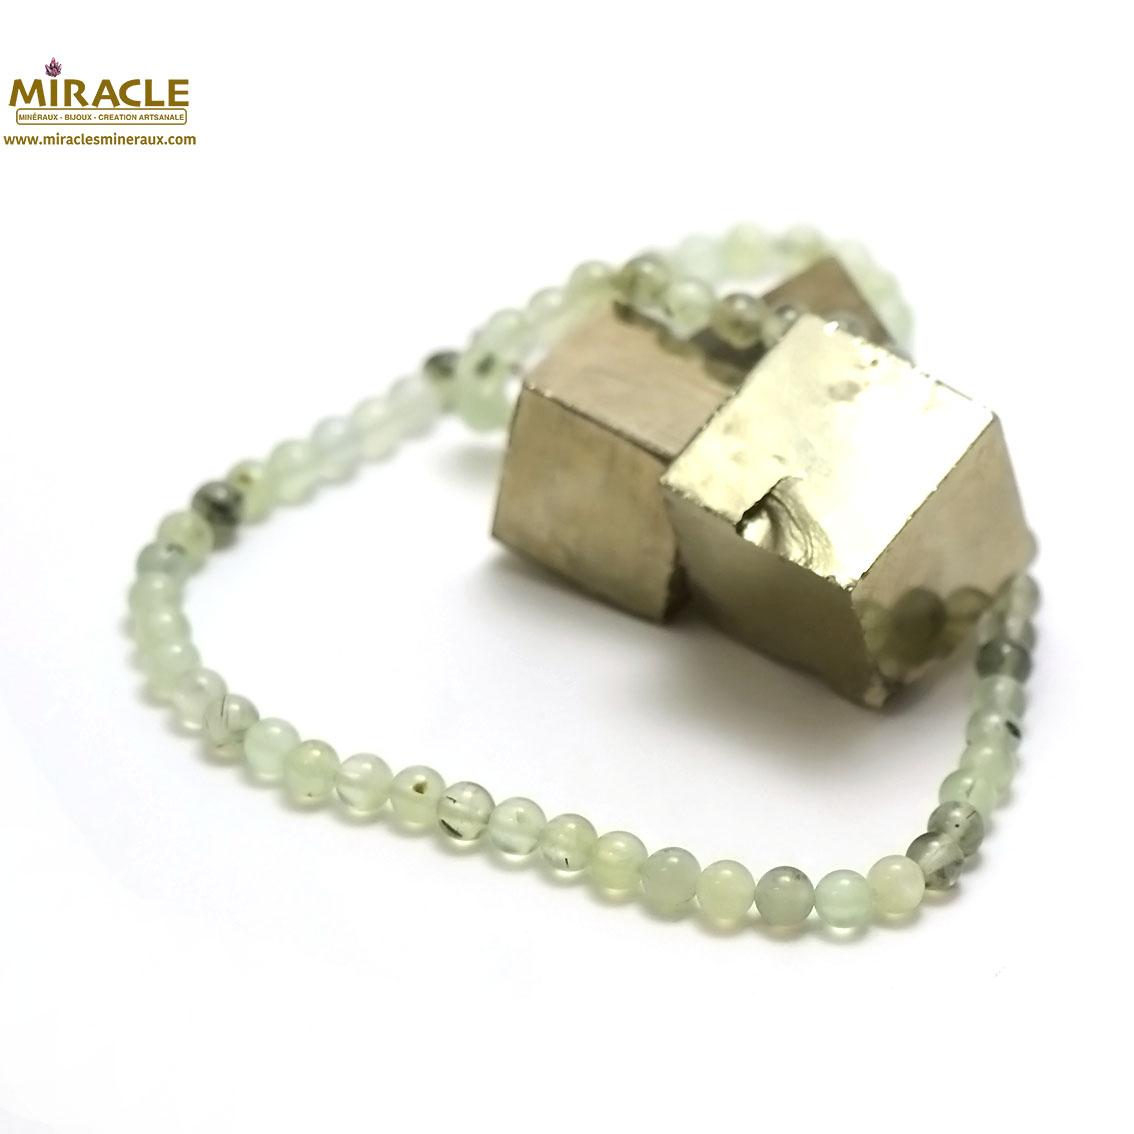 Collier préhnite, perle ronde 6 mm